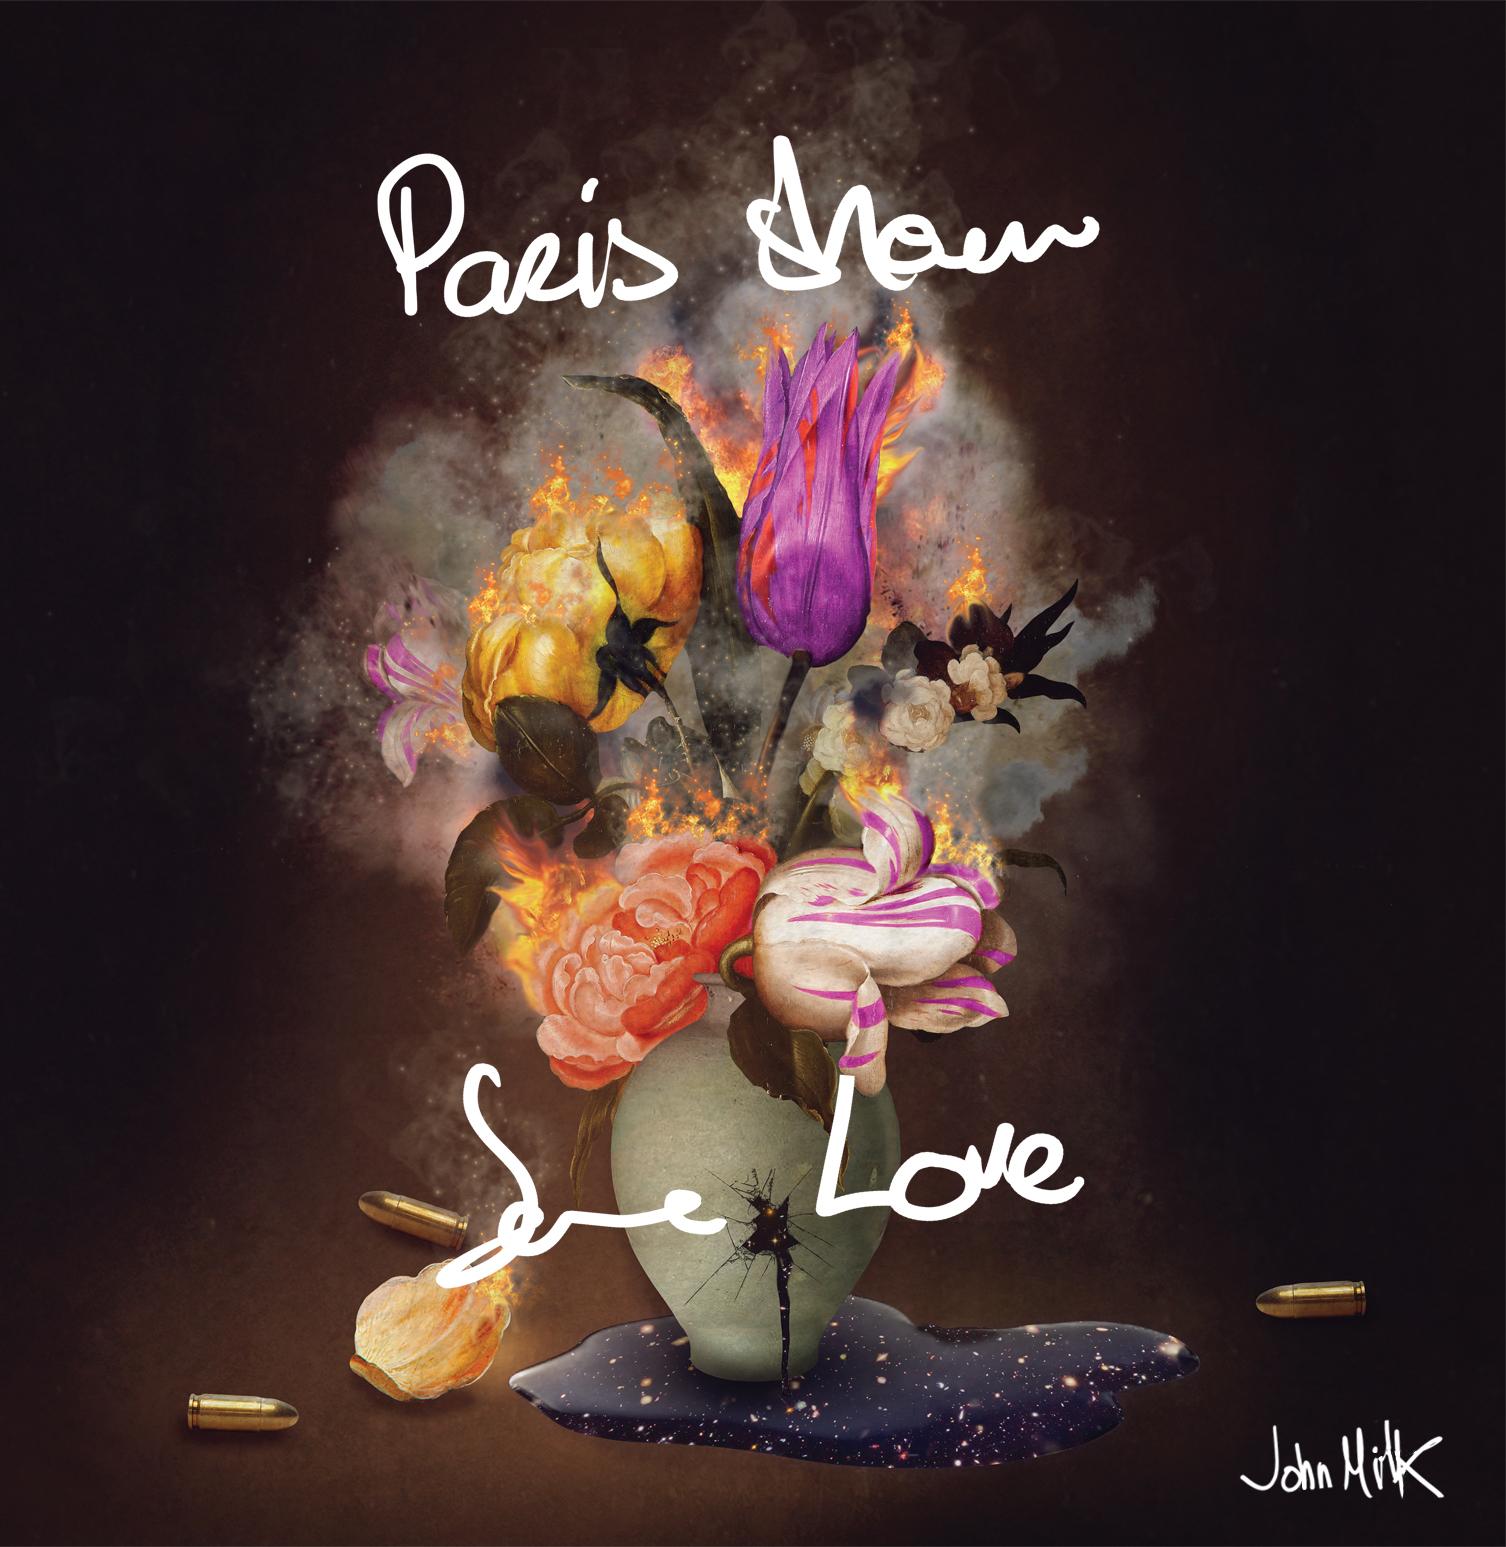 John Milk, Paris Show Some Love